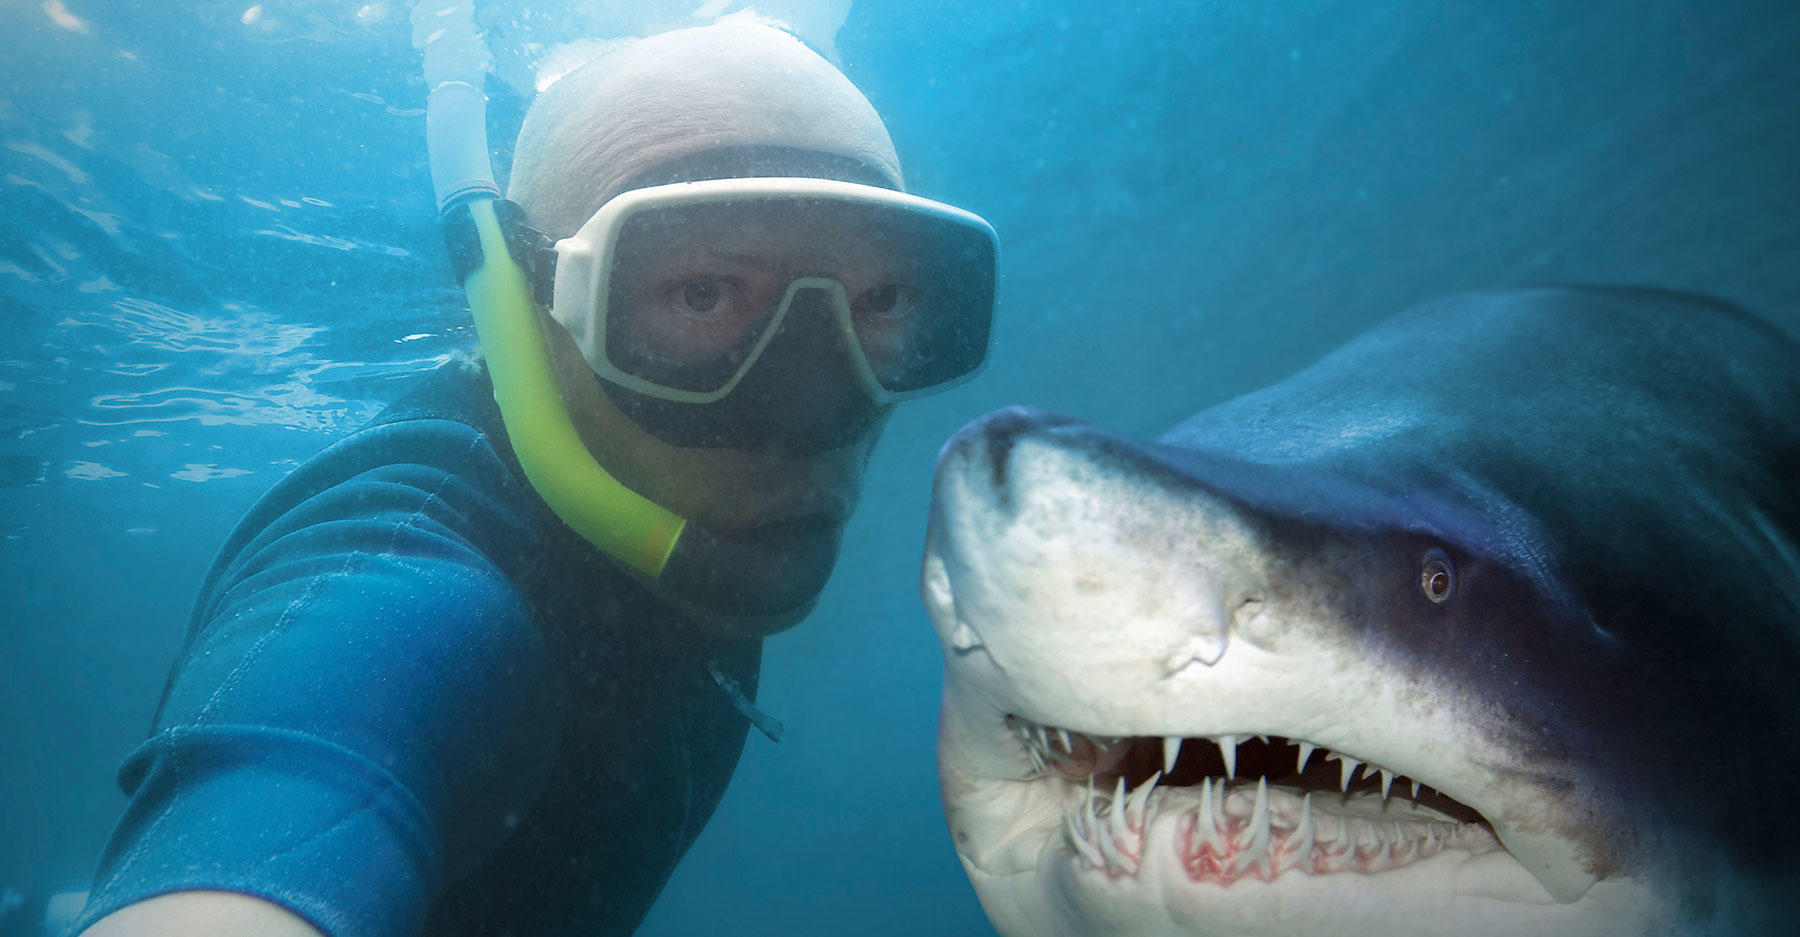 Shark diver takes selfie